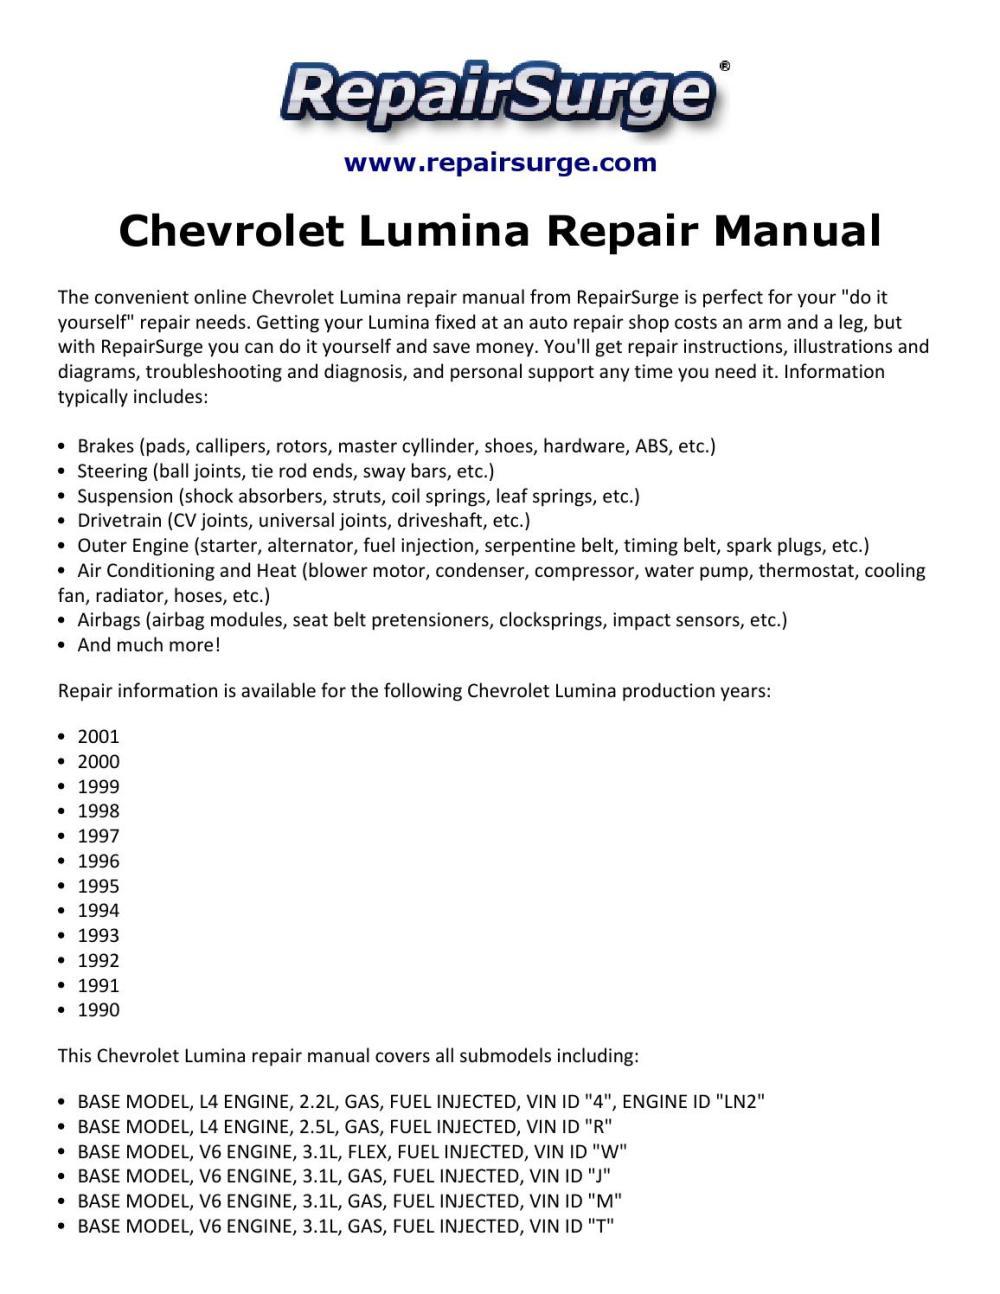 medium resolution of chevrolet lumina repair manual 1990 2001